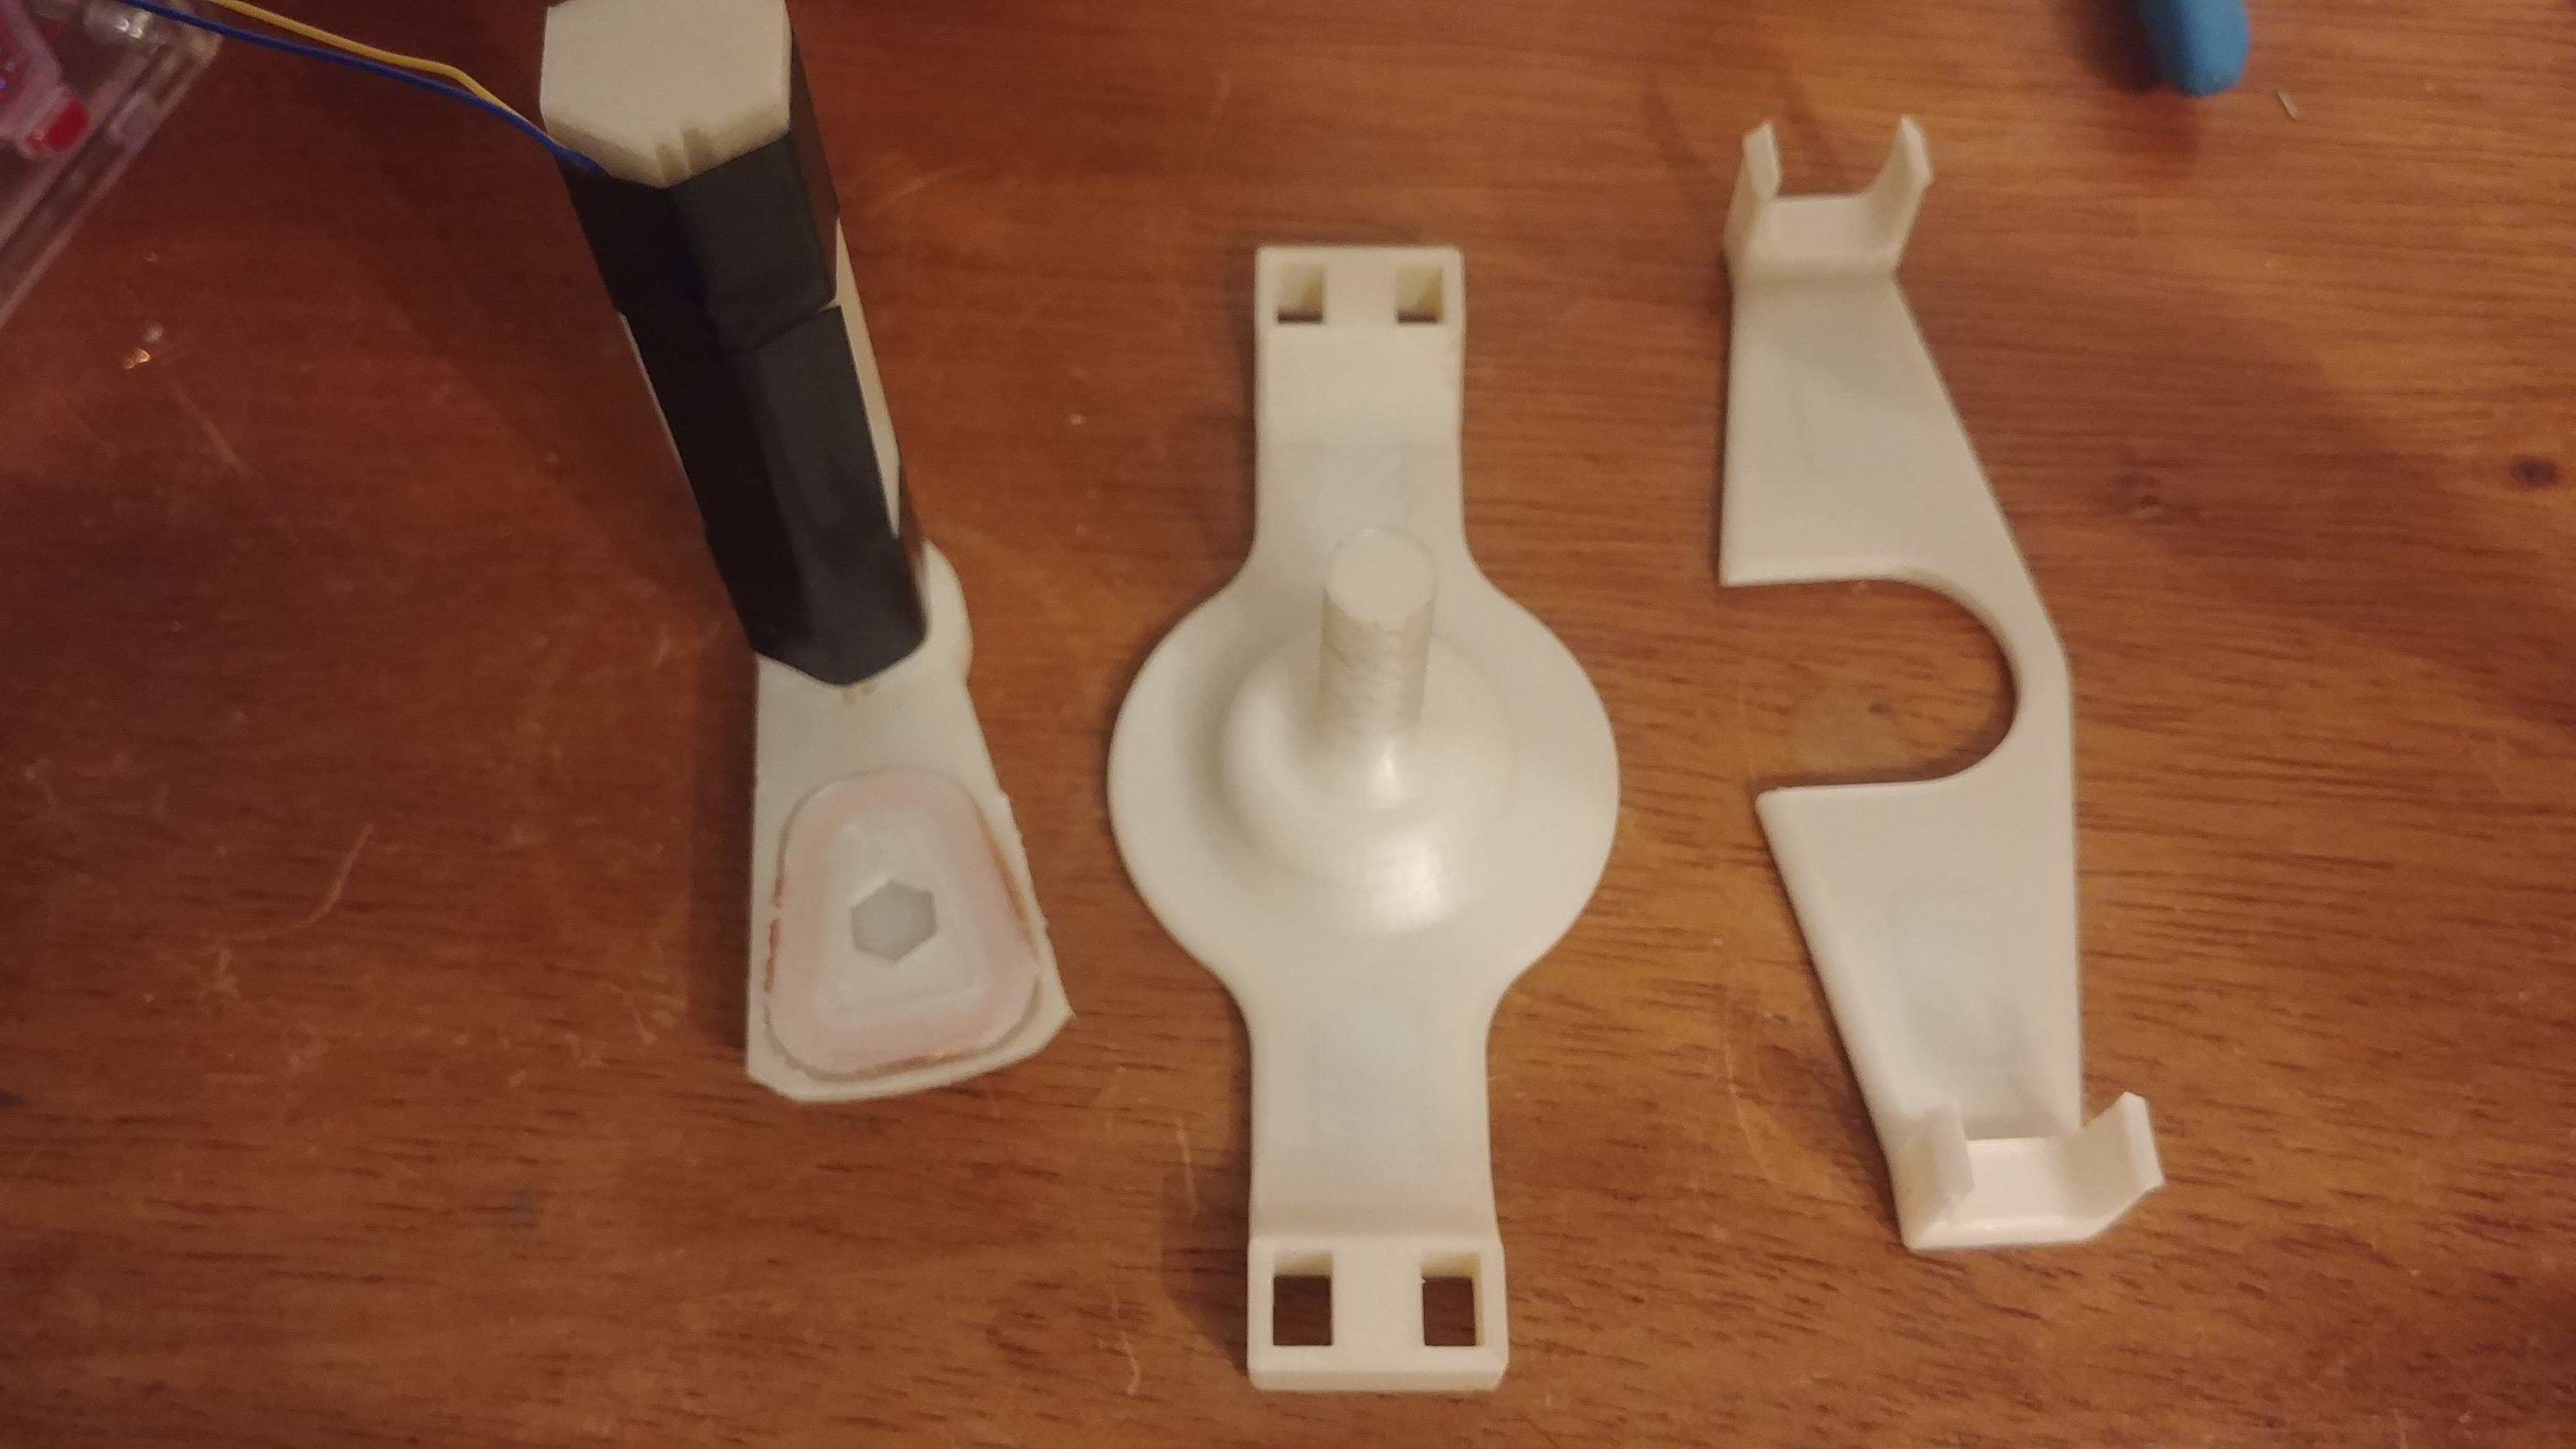 20190910_202718.jpg Download free STL file basic electric generator • 3D printable design, lukeskymuh